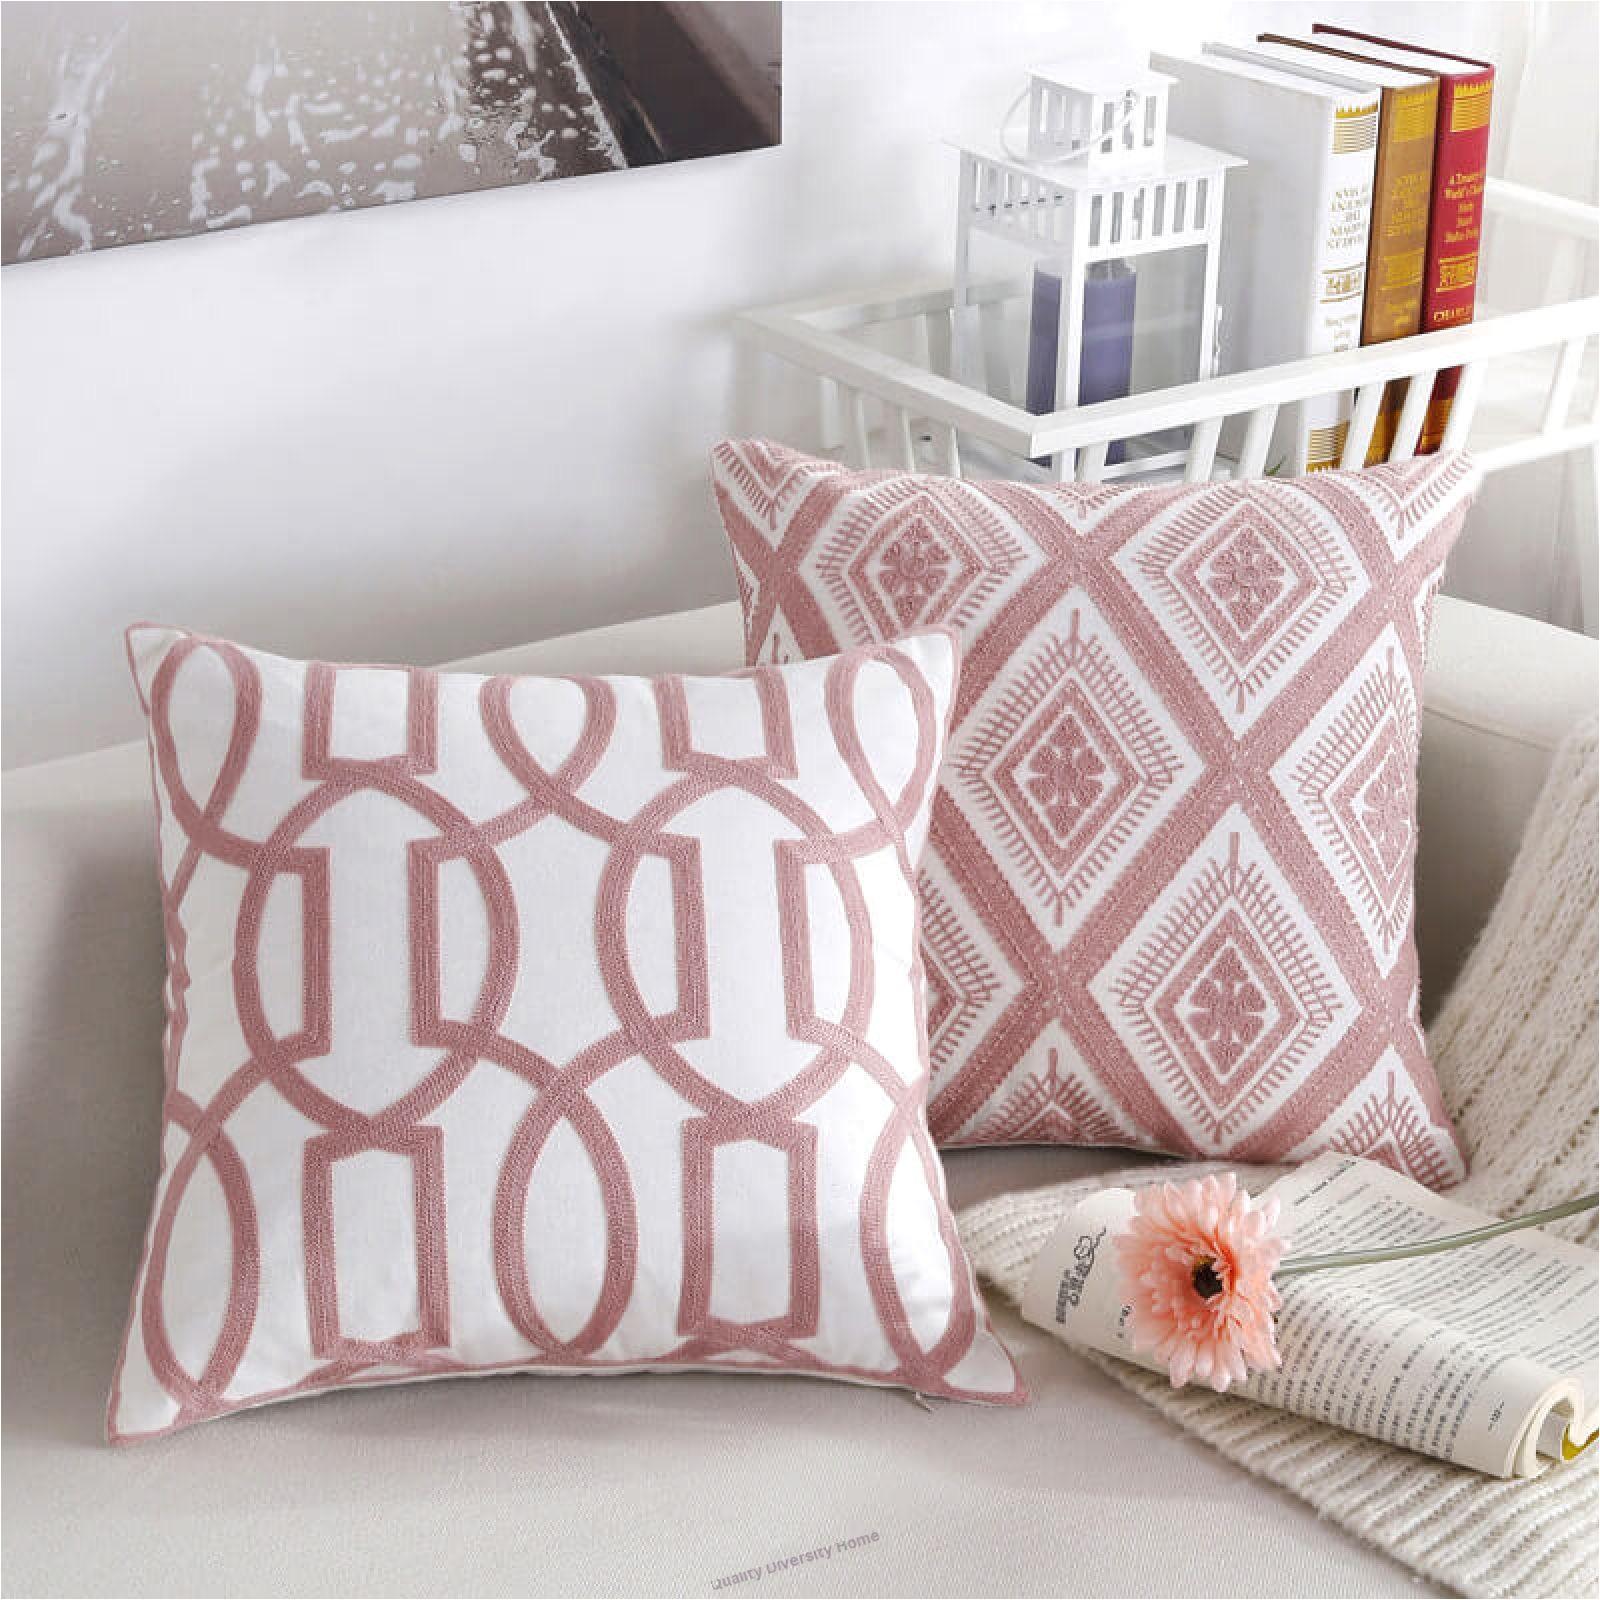 pink series decorative throw pillow case 18 x 18 45cm x 45cm set of 4